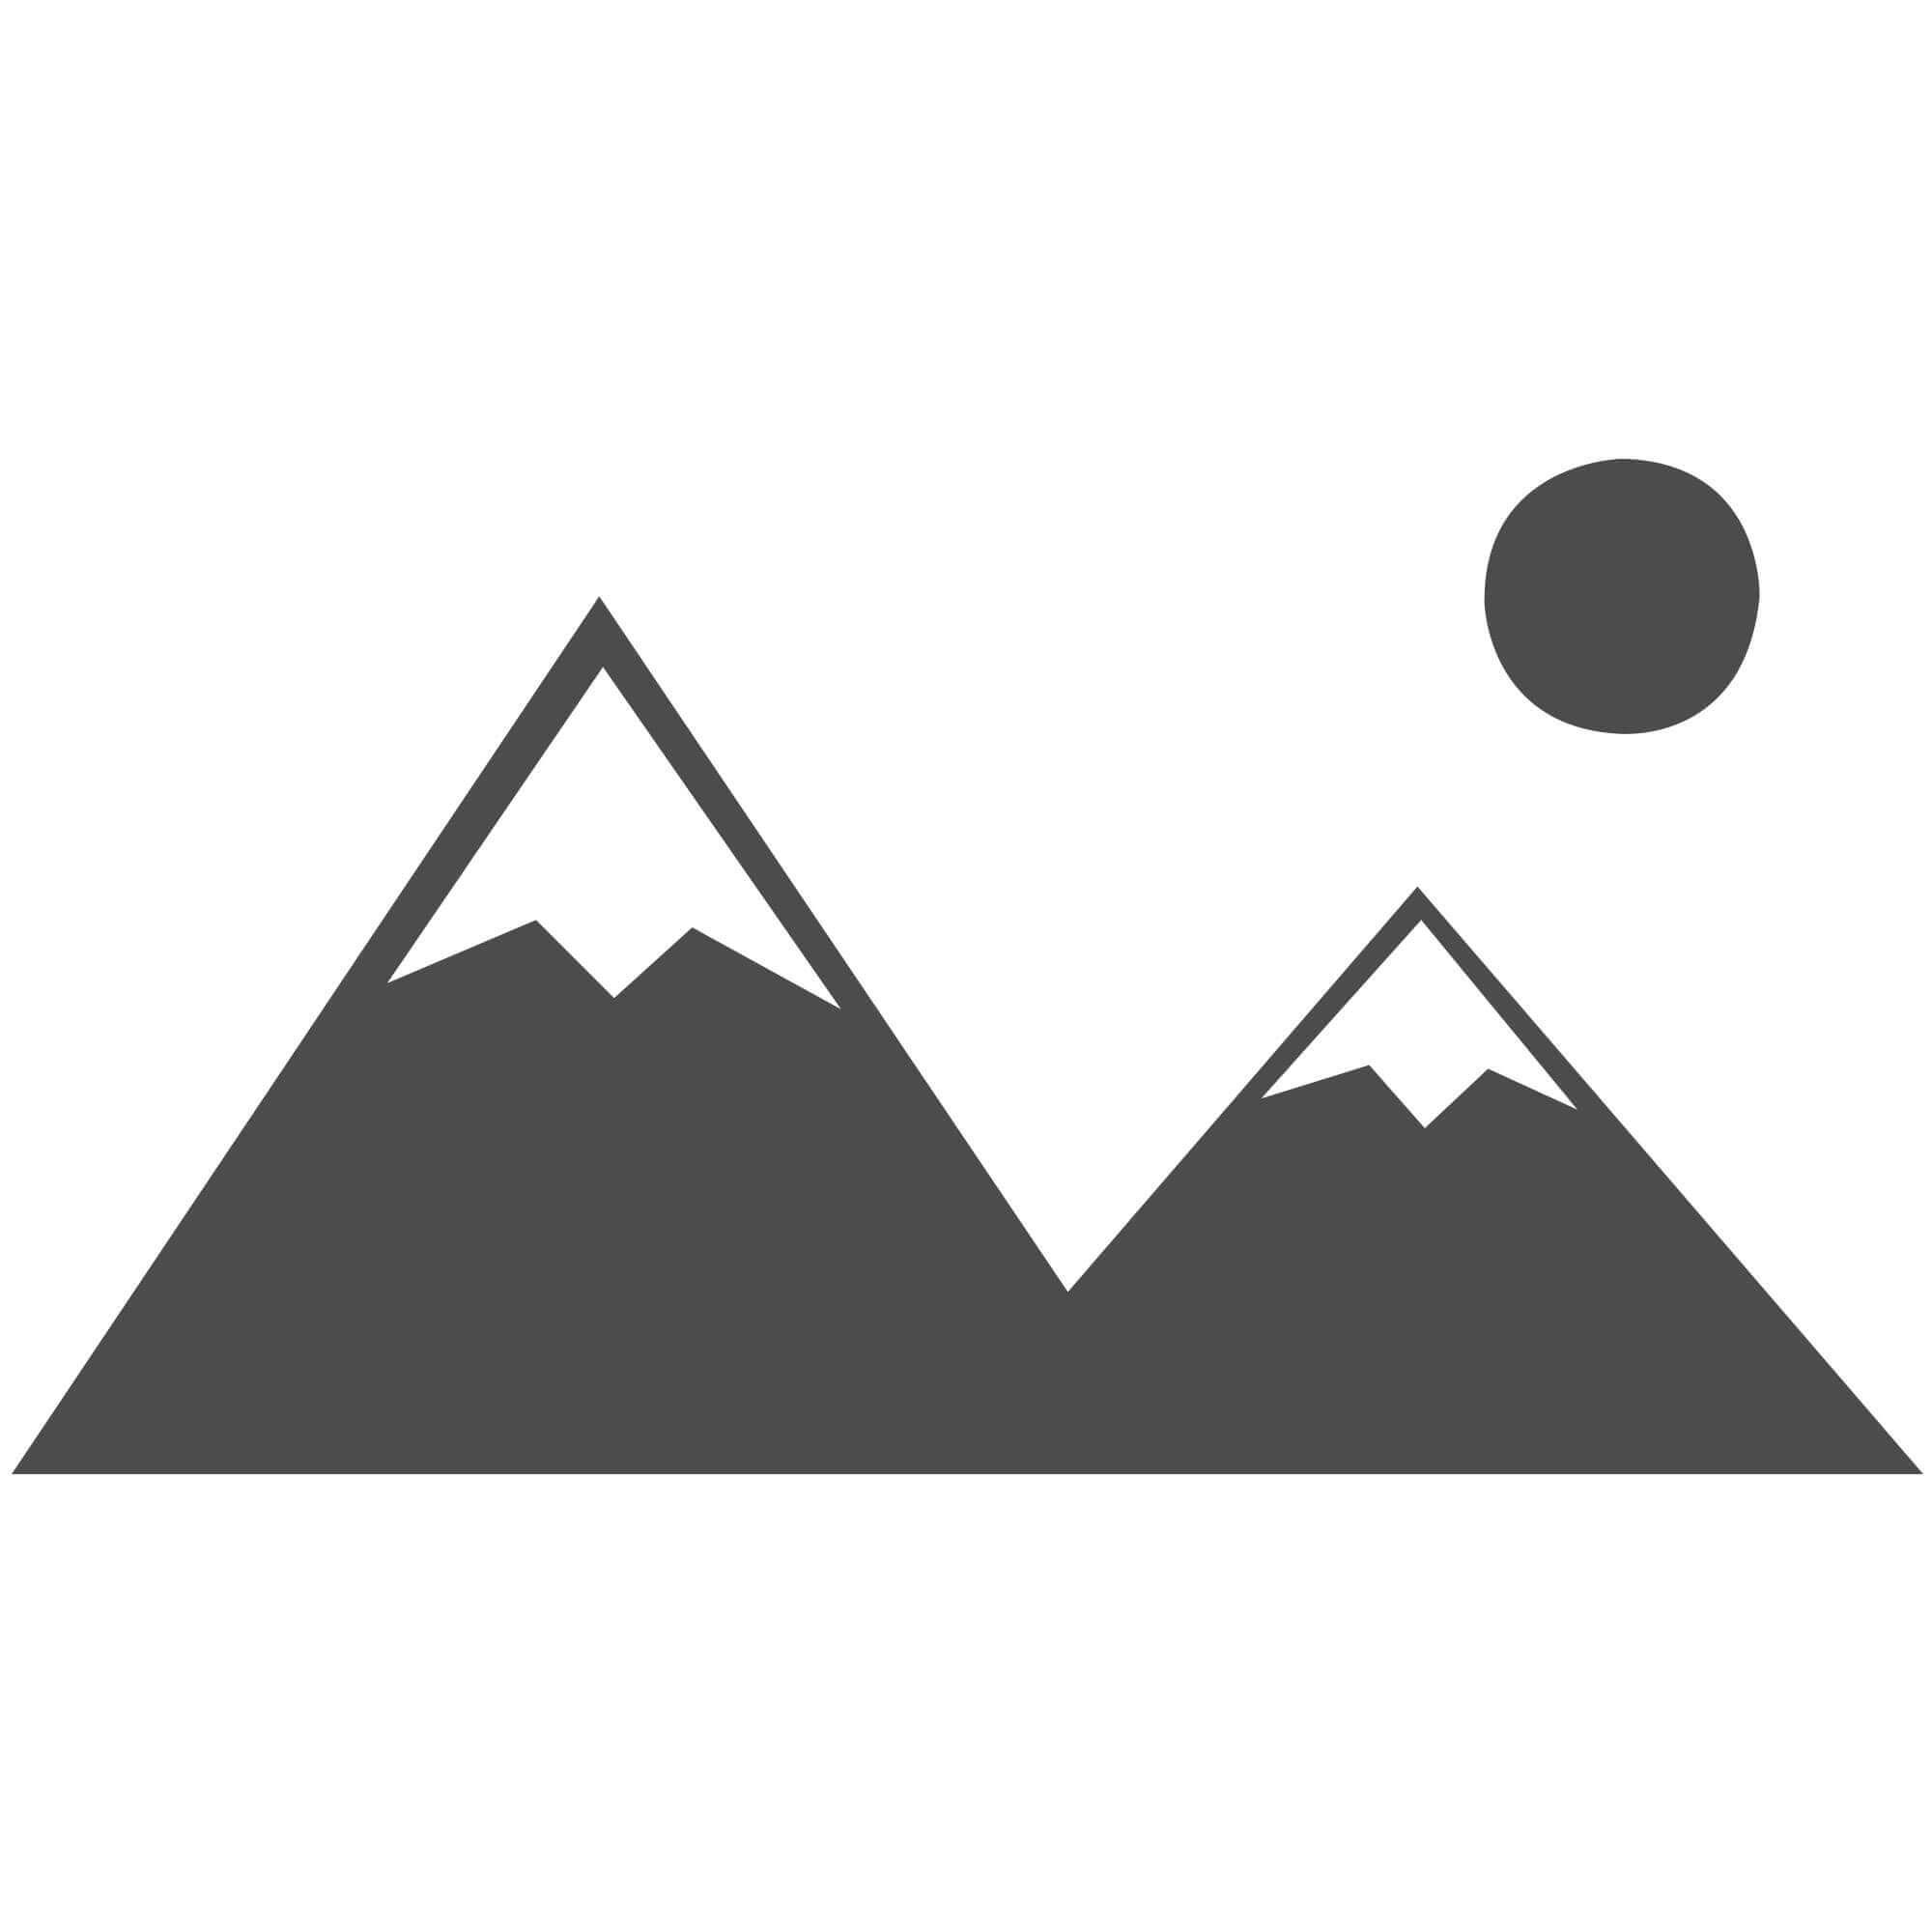 "Nordic Cariboo Shaggy Rug - Brown - Size 120 x 170 cm (4' x 5'7"")"